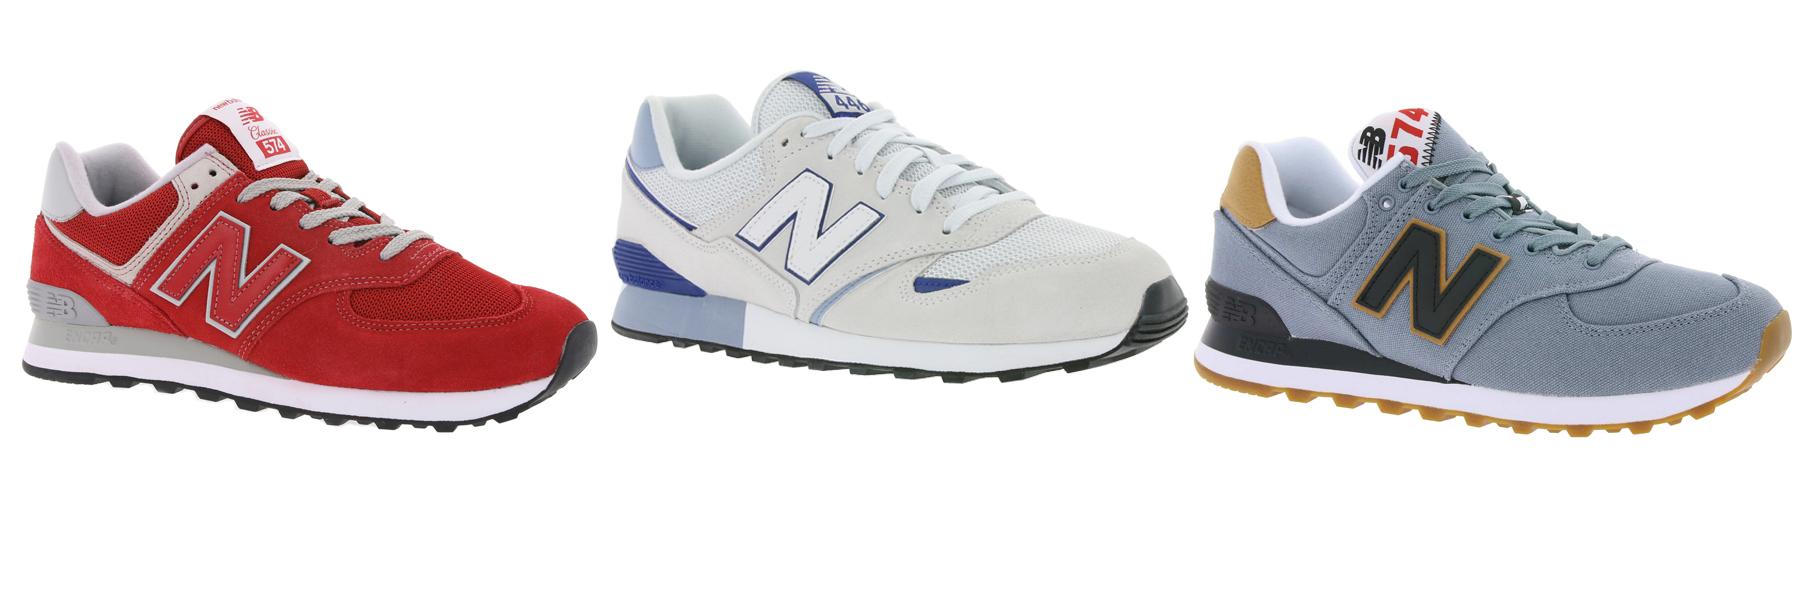 New Balance Herren Sneaker SALE - günstig im Online Shop & Outlet 46